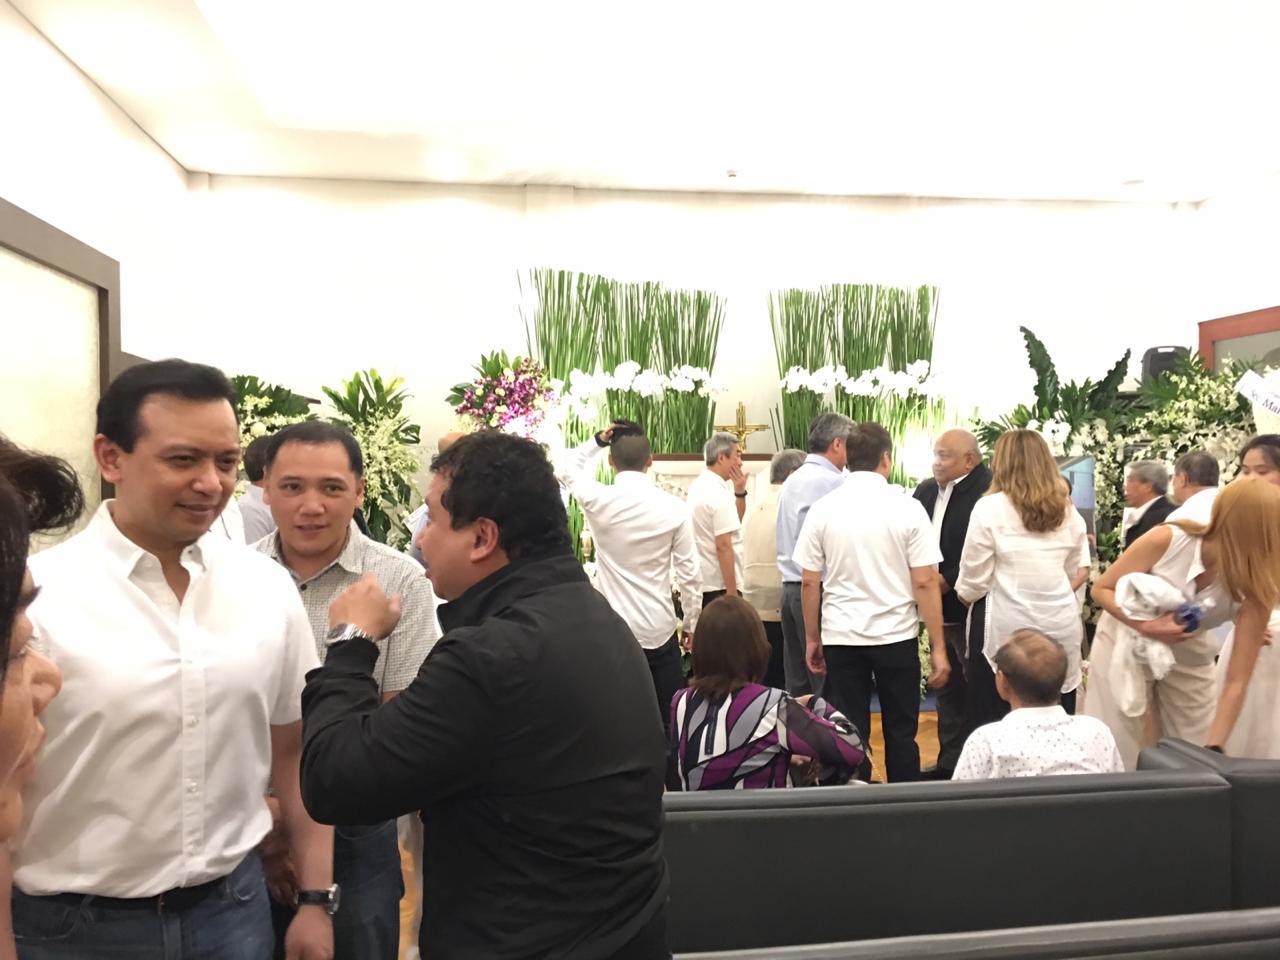 AWKWARD? Senator Antonio Trillanes IV in the same room as Executive Secretary Salvador Medialdea (right) and Finance Secretary Carlos Dominguez III (not in photo). Photo by Ralf Rivas/Rappler